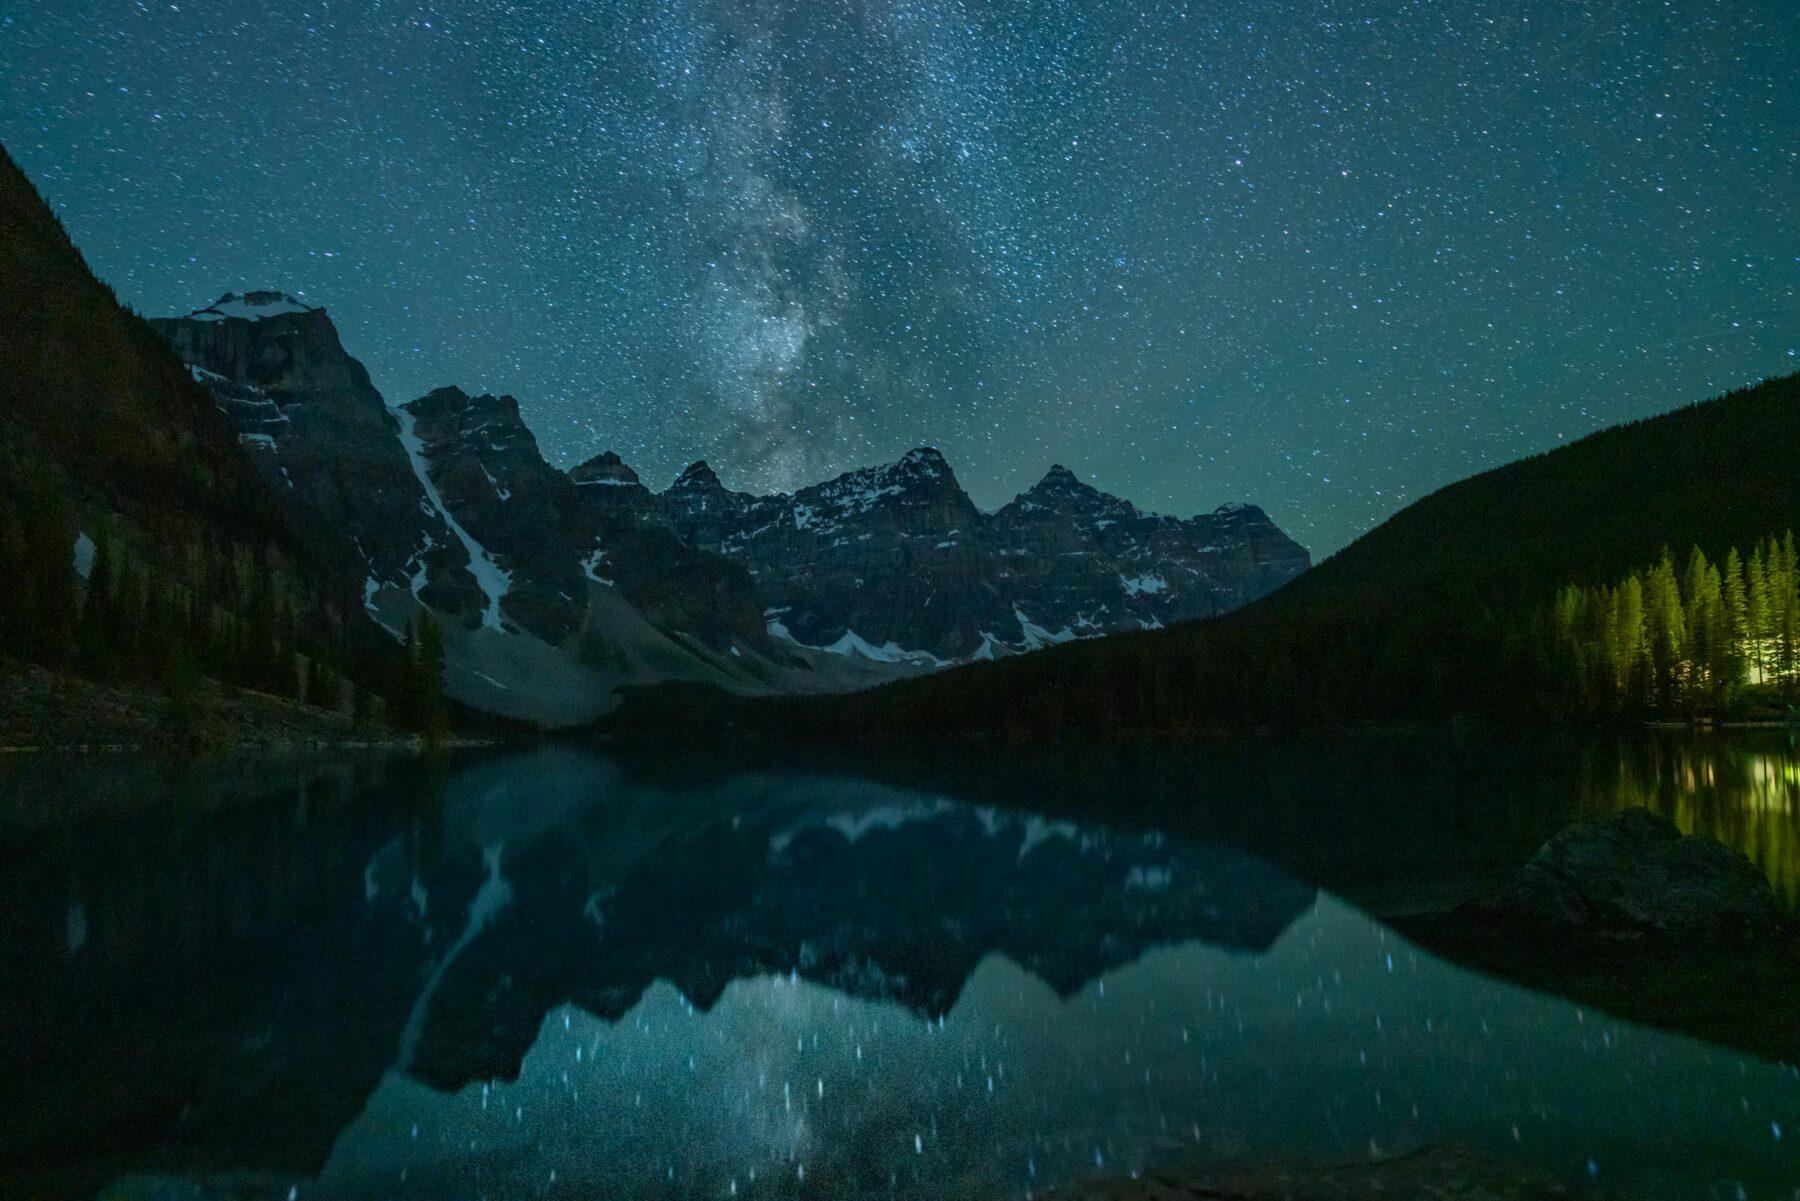 Milkyway over Moraine Lake